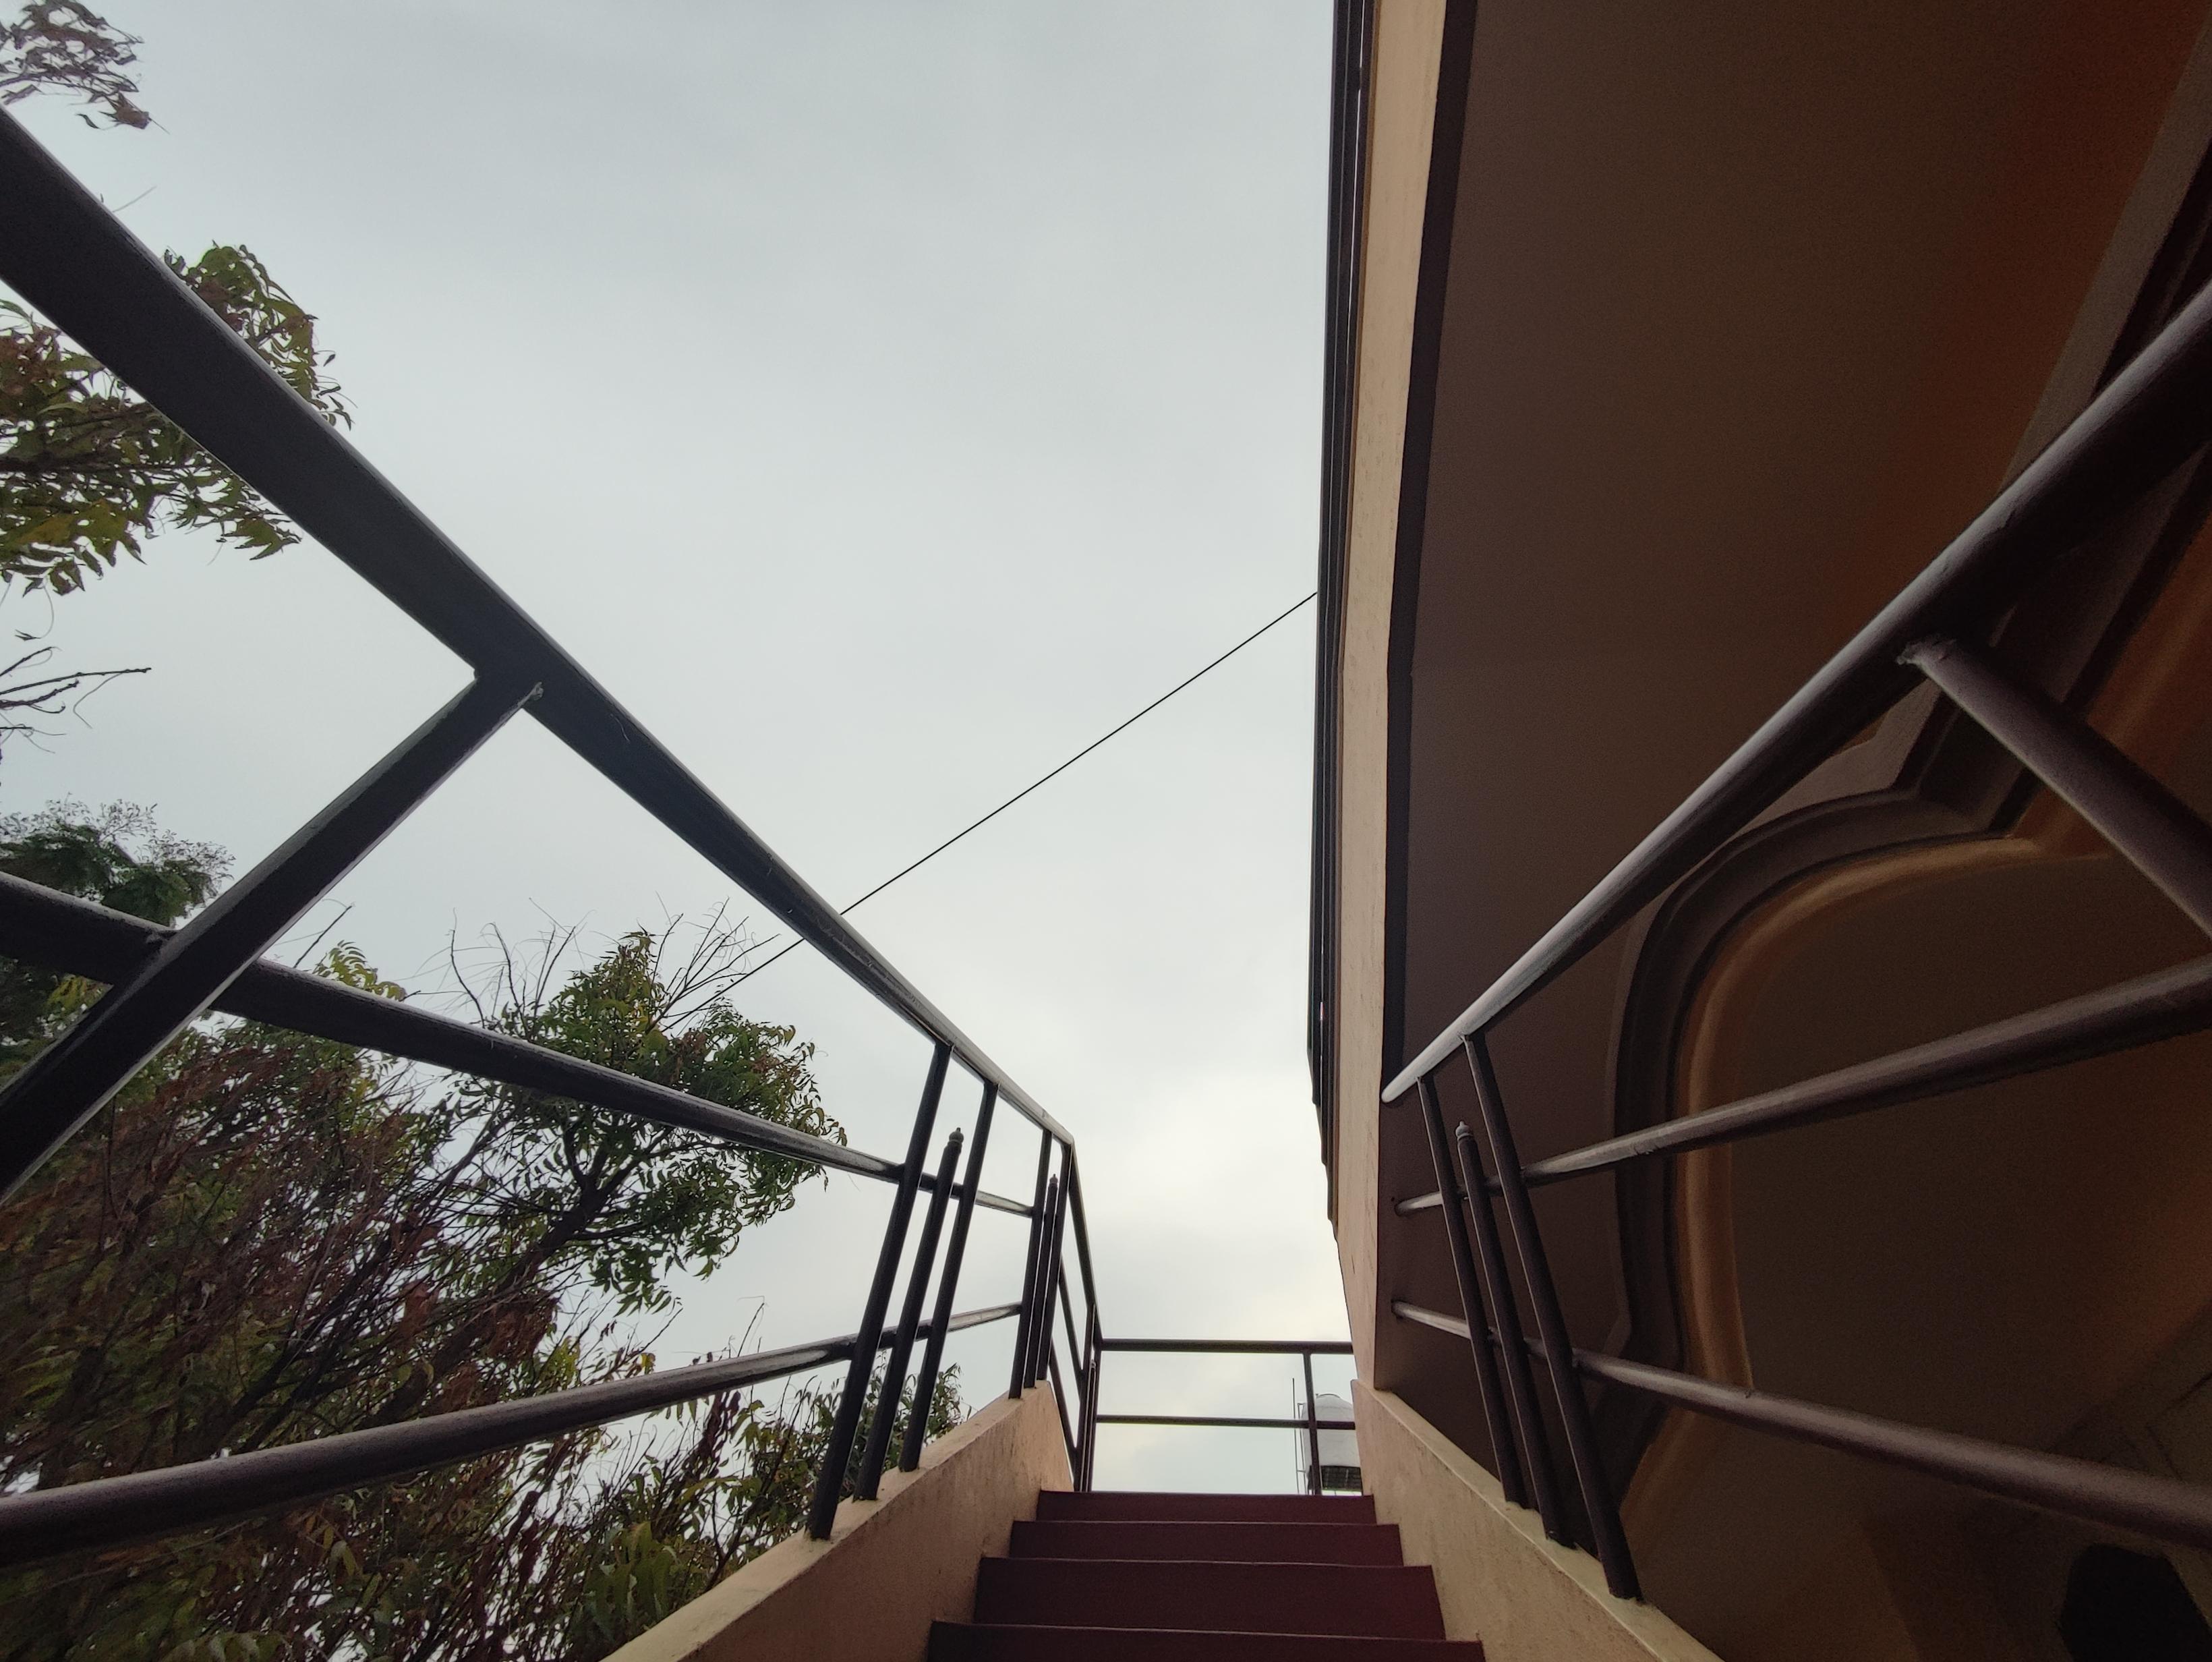 Mi 11X camera samples